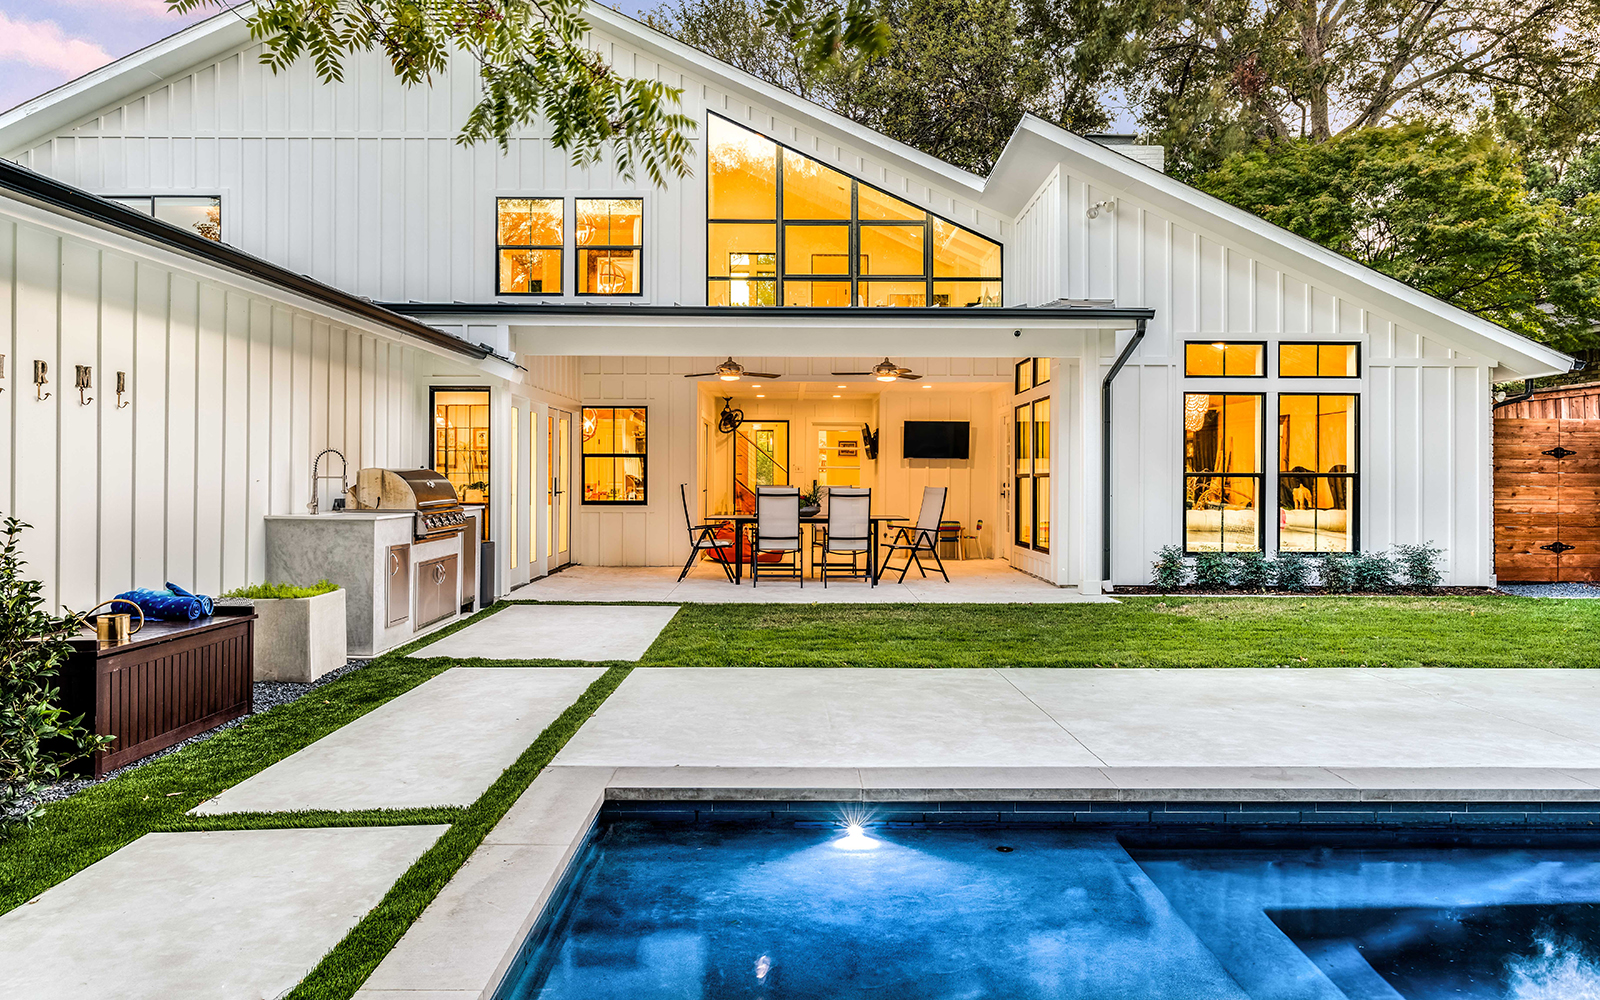 lakewood-pool-rear-modern-porch.jpg